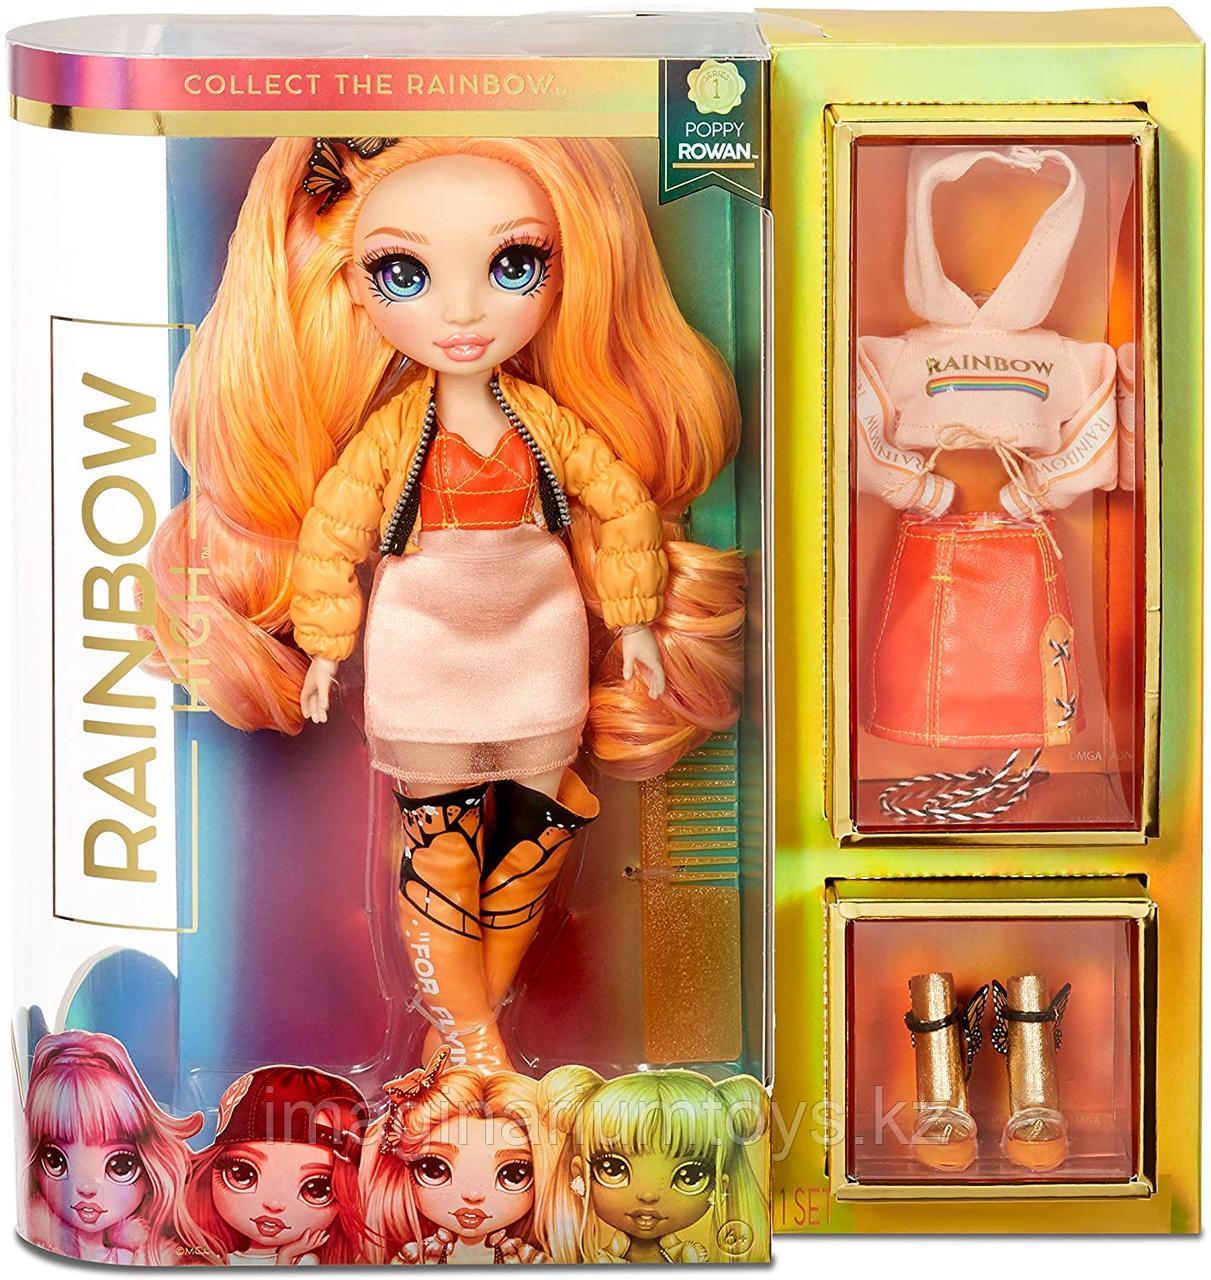 Кукла Реинбоу Хай оранжевая Rainbow High Surprise Poppy Rowan